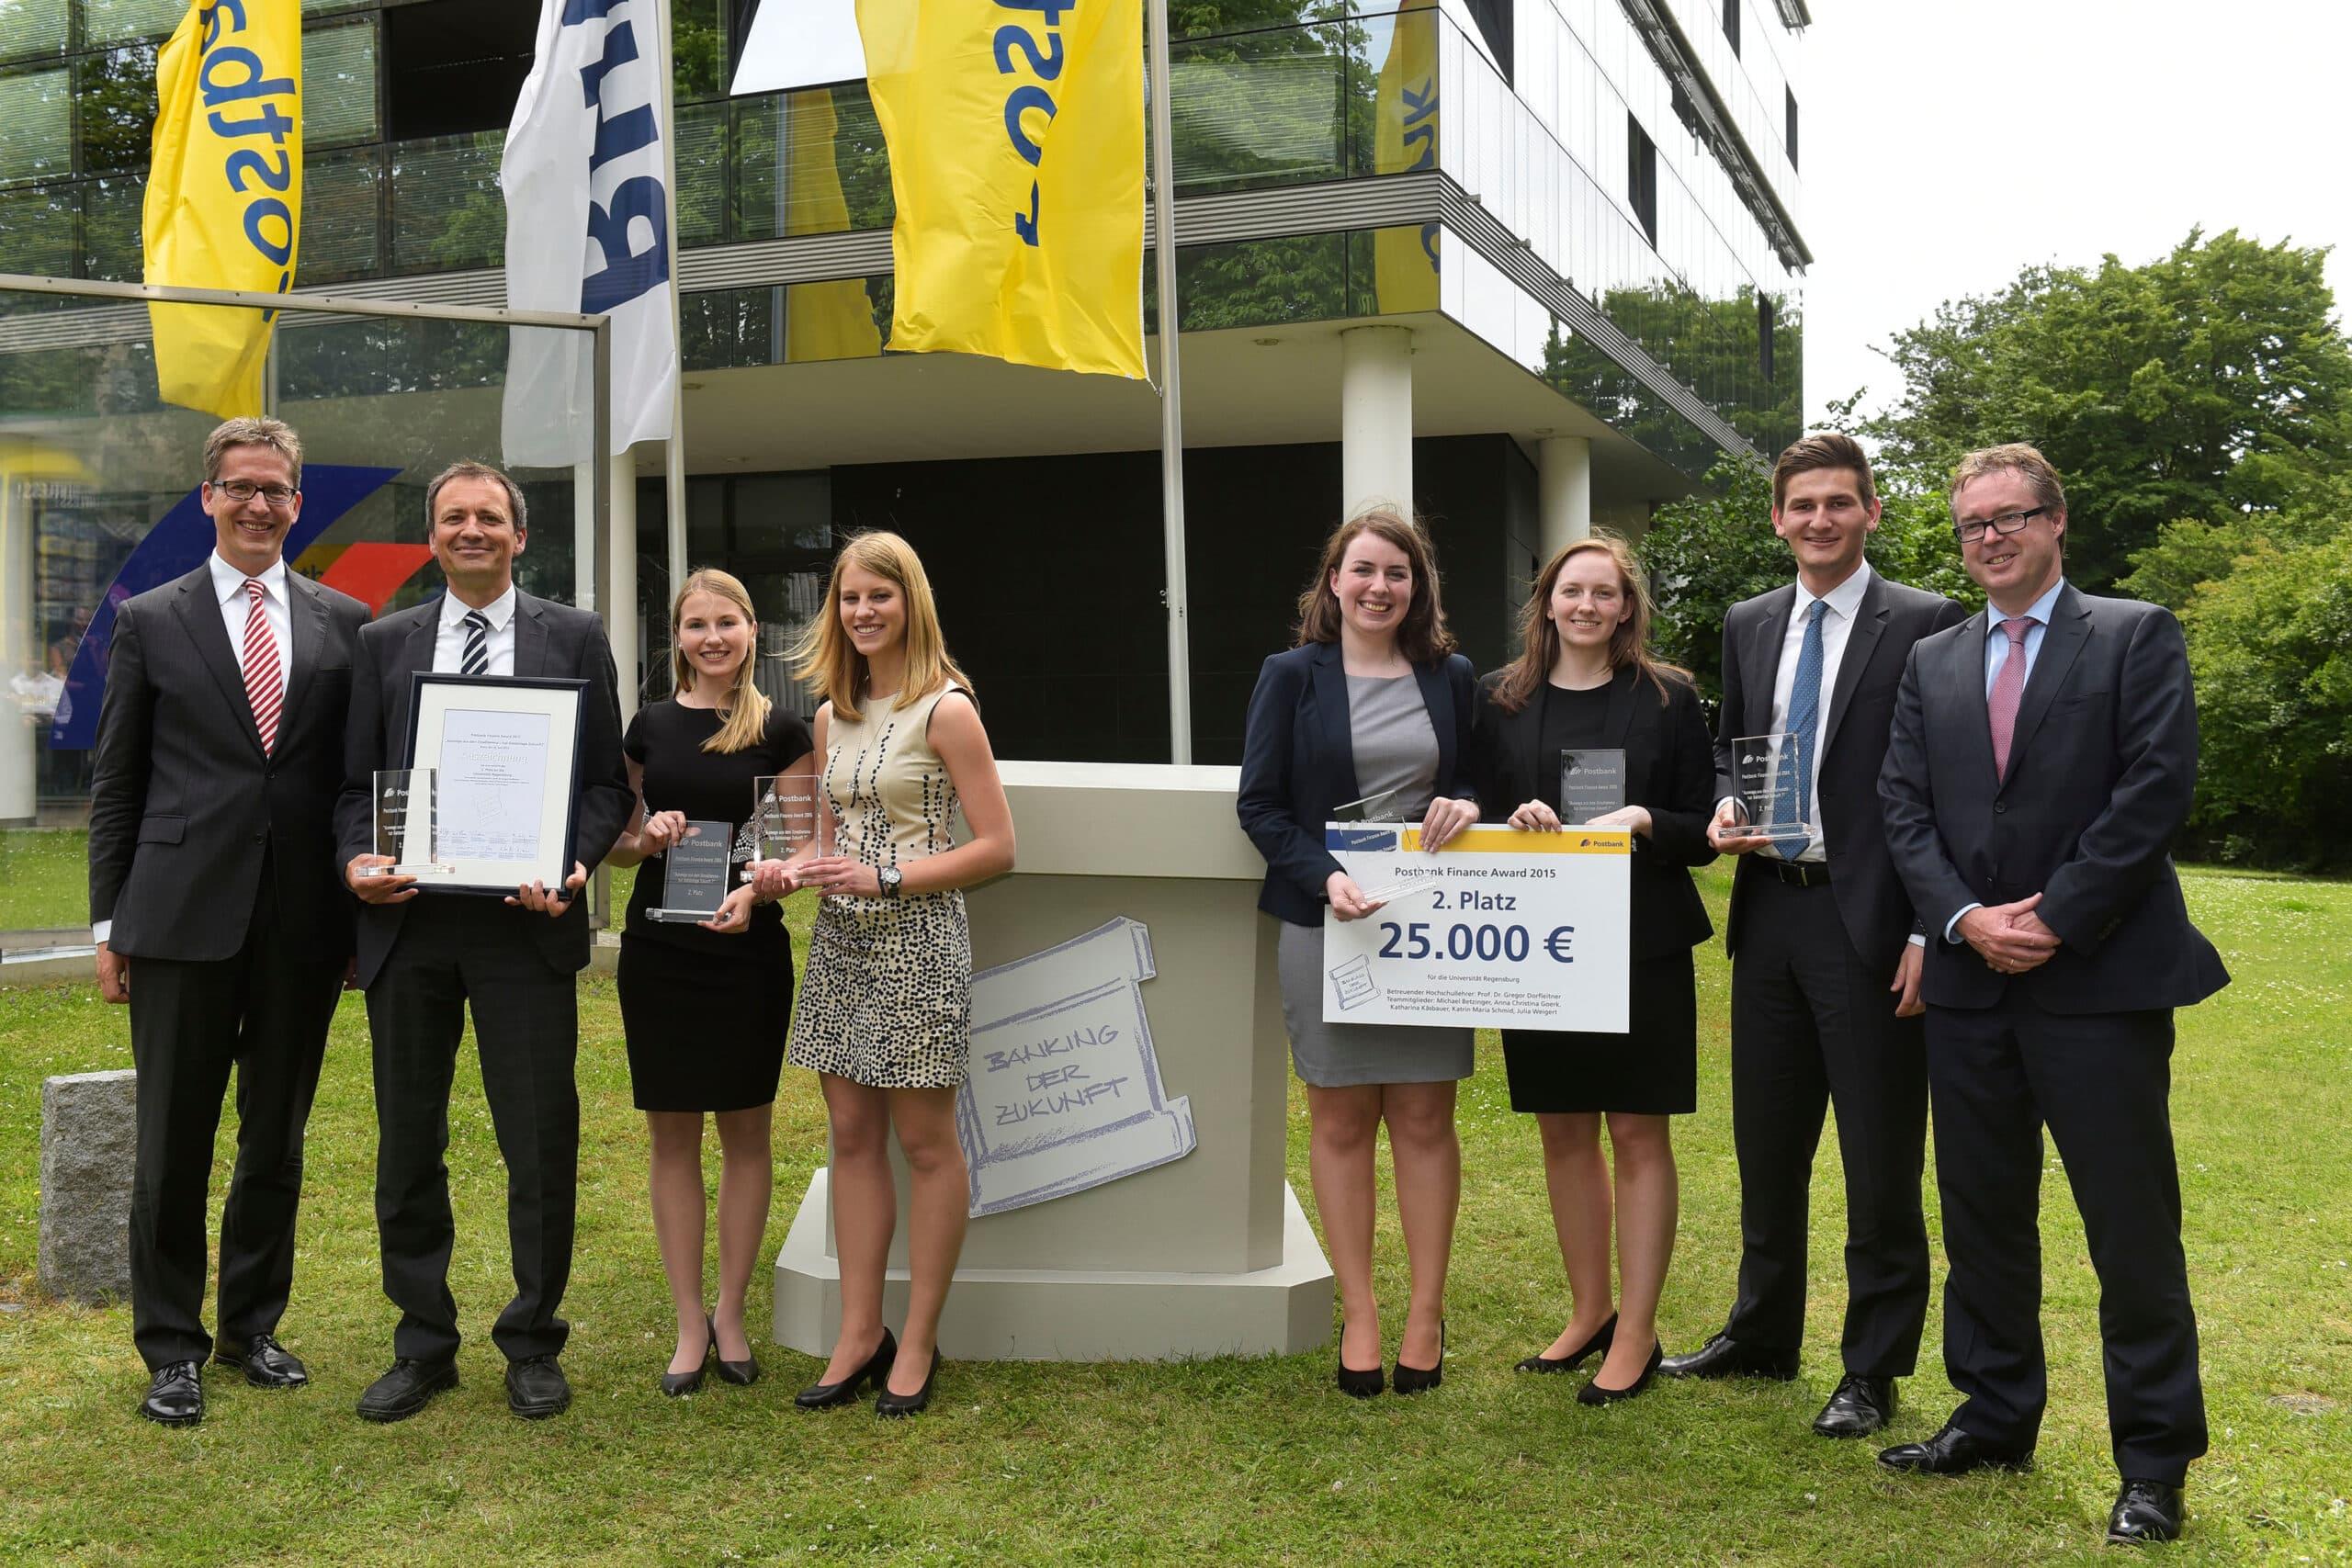 postbank finance award 2 platz f r regensburg regensburg digital. Black Bedroom Furniture Sets. Home Design Ideas